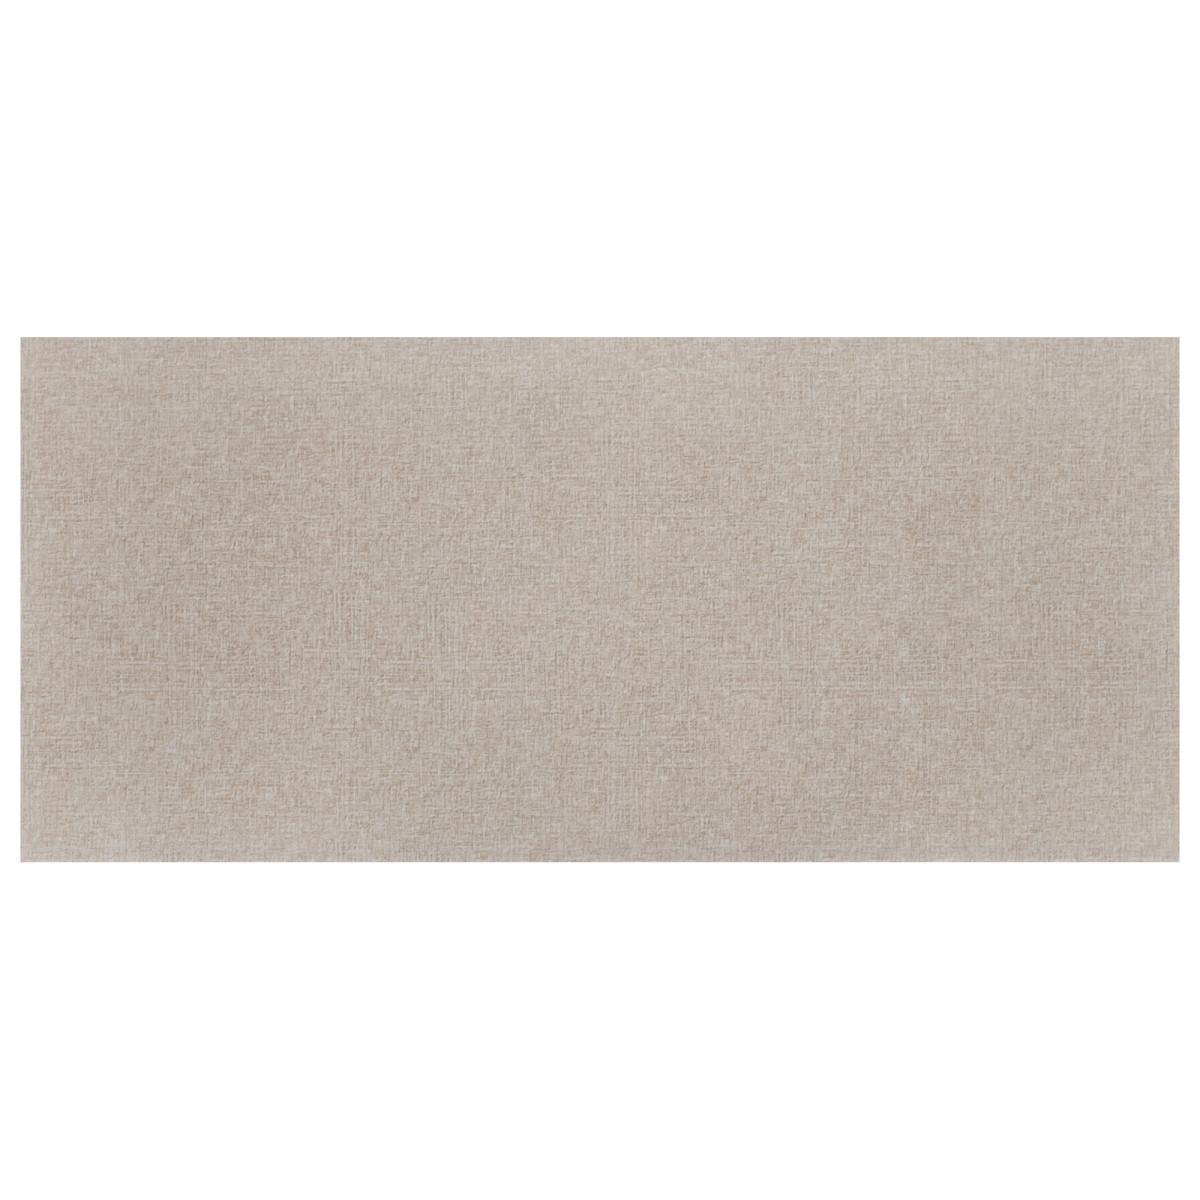 Плитка настенная Visconti 50х23 см 1.15 м2 цвет светло-бежевый